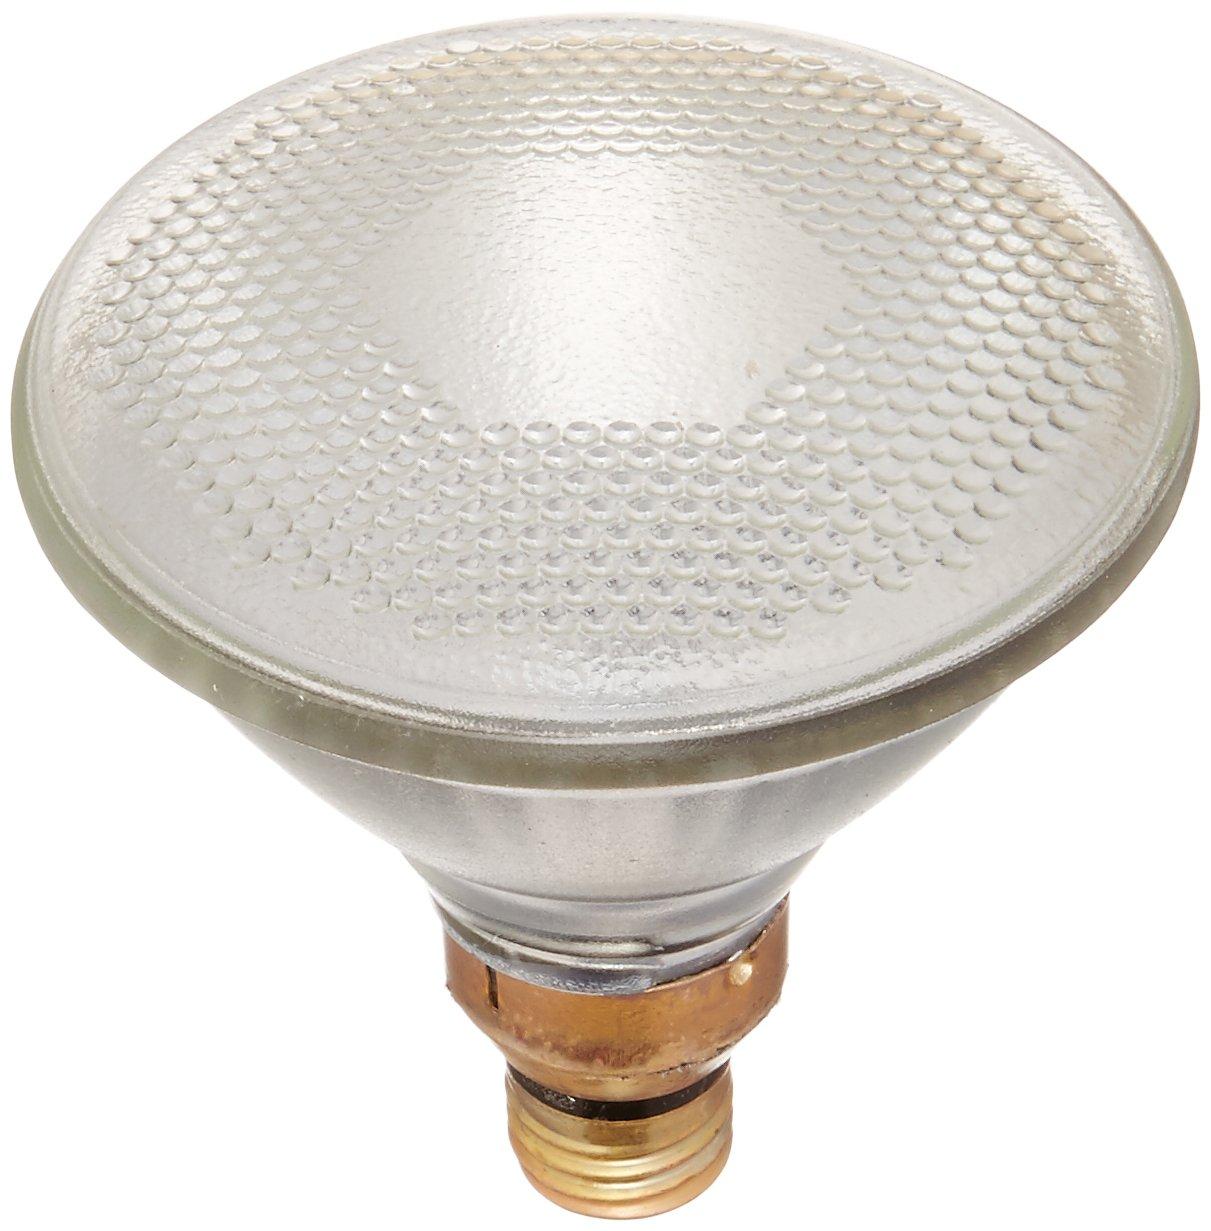 GE Lighting 48037 150-Watt 1700-Lumen Outdoor Floodlight Saf-T-Gard Light  Bulb, Clear - - Amazon.com - GE Lighting 48037 150-Watt 1700-Lumen Outdoor Floodlight Saf-T